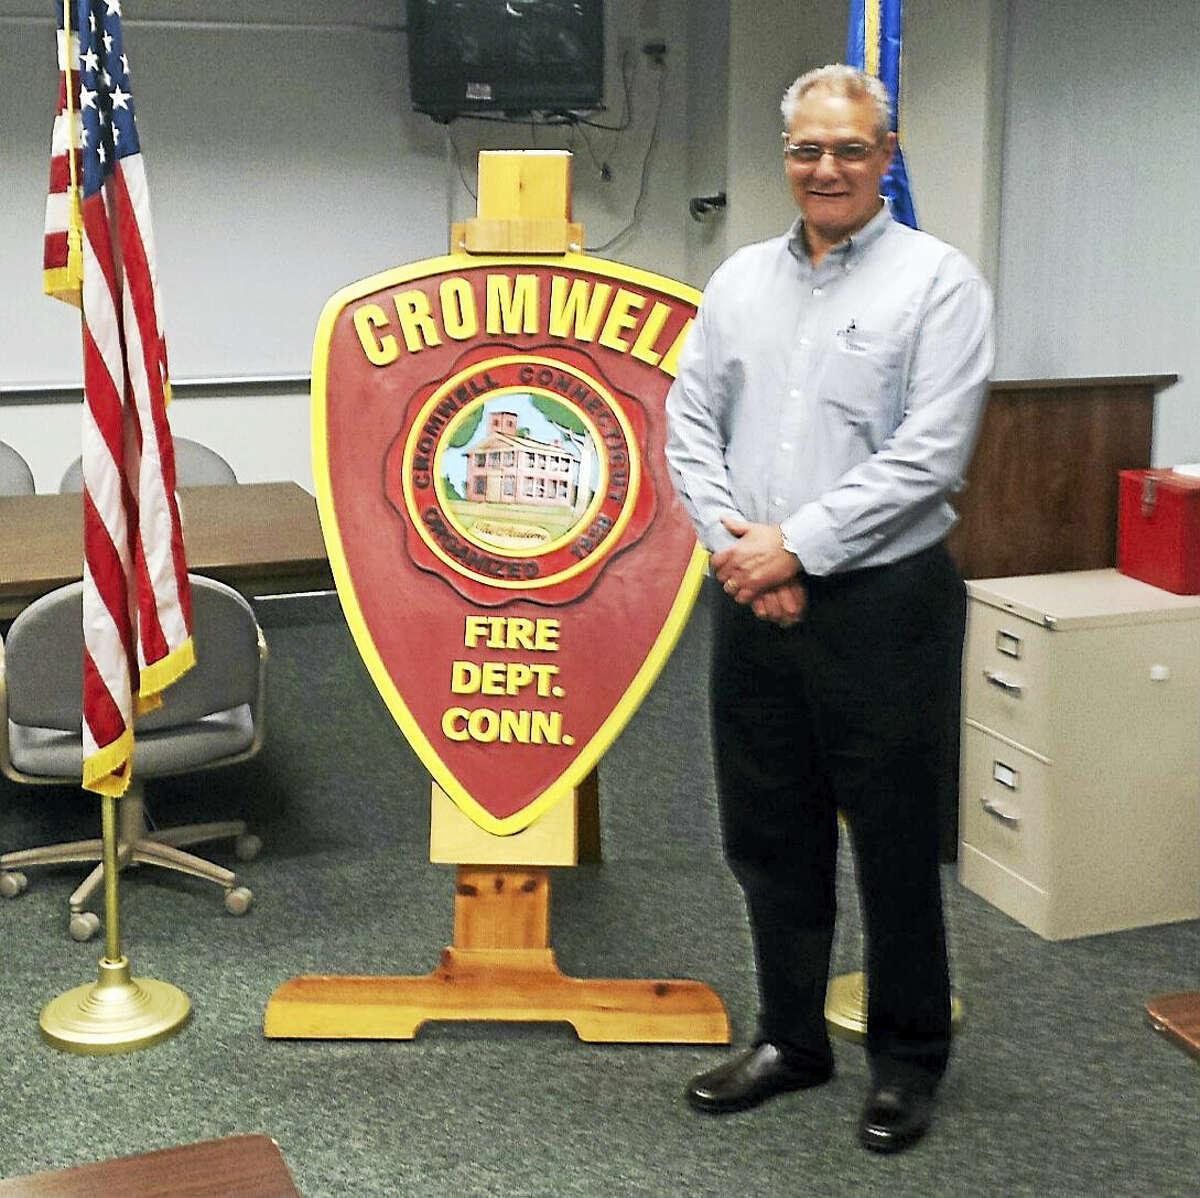 Cromwell Fire Department Chief Michael R. Terenzio